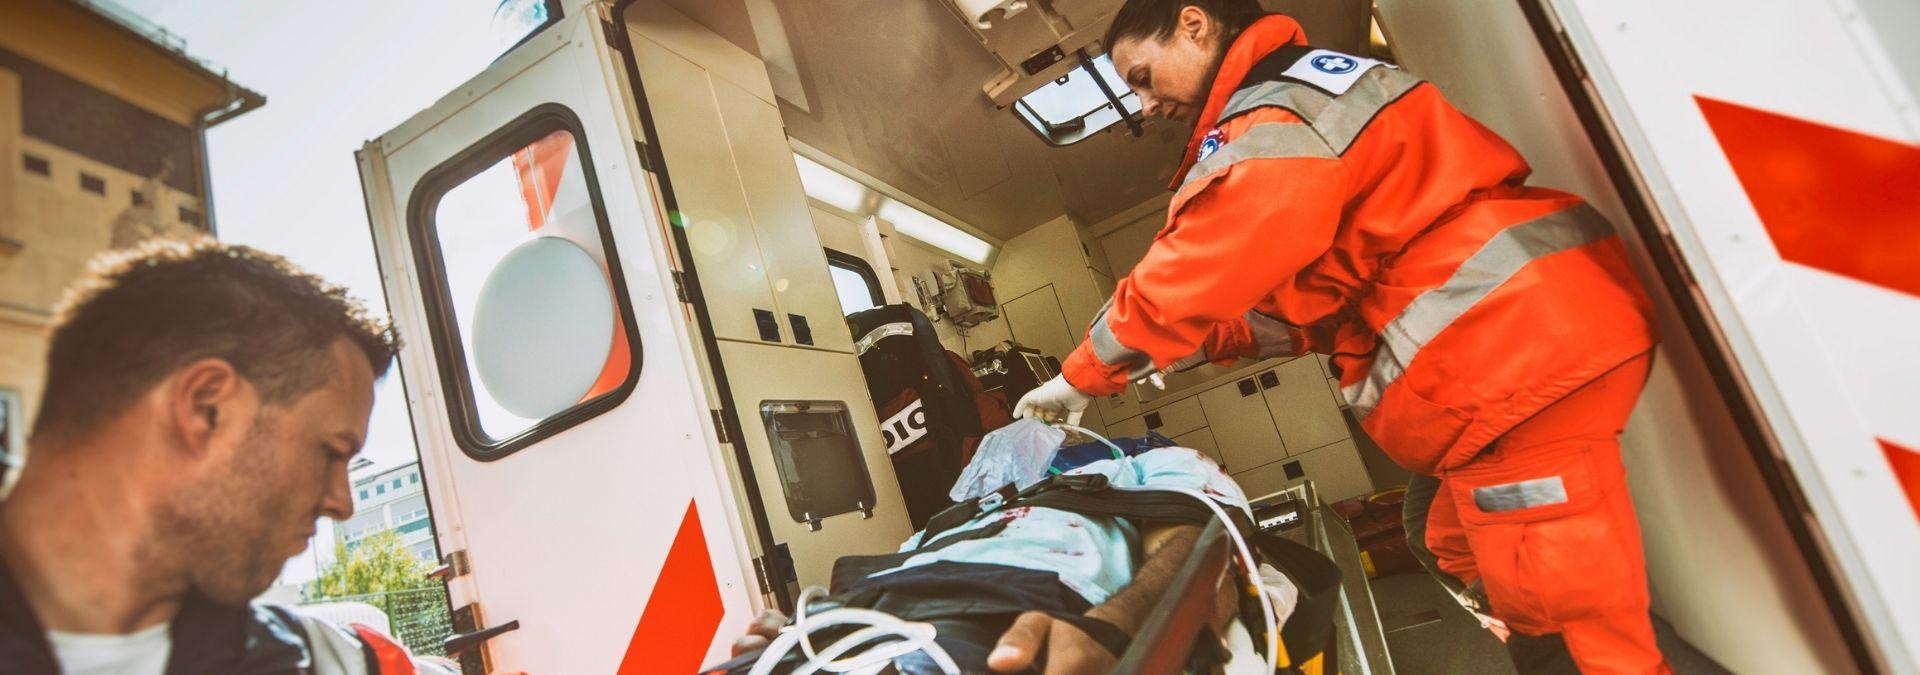 Emergency Medical Technician-Paramedic